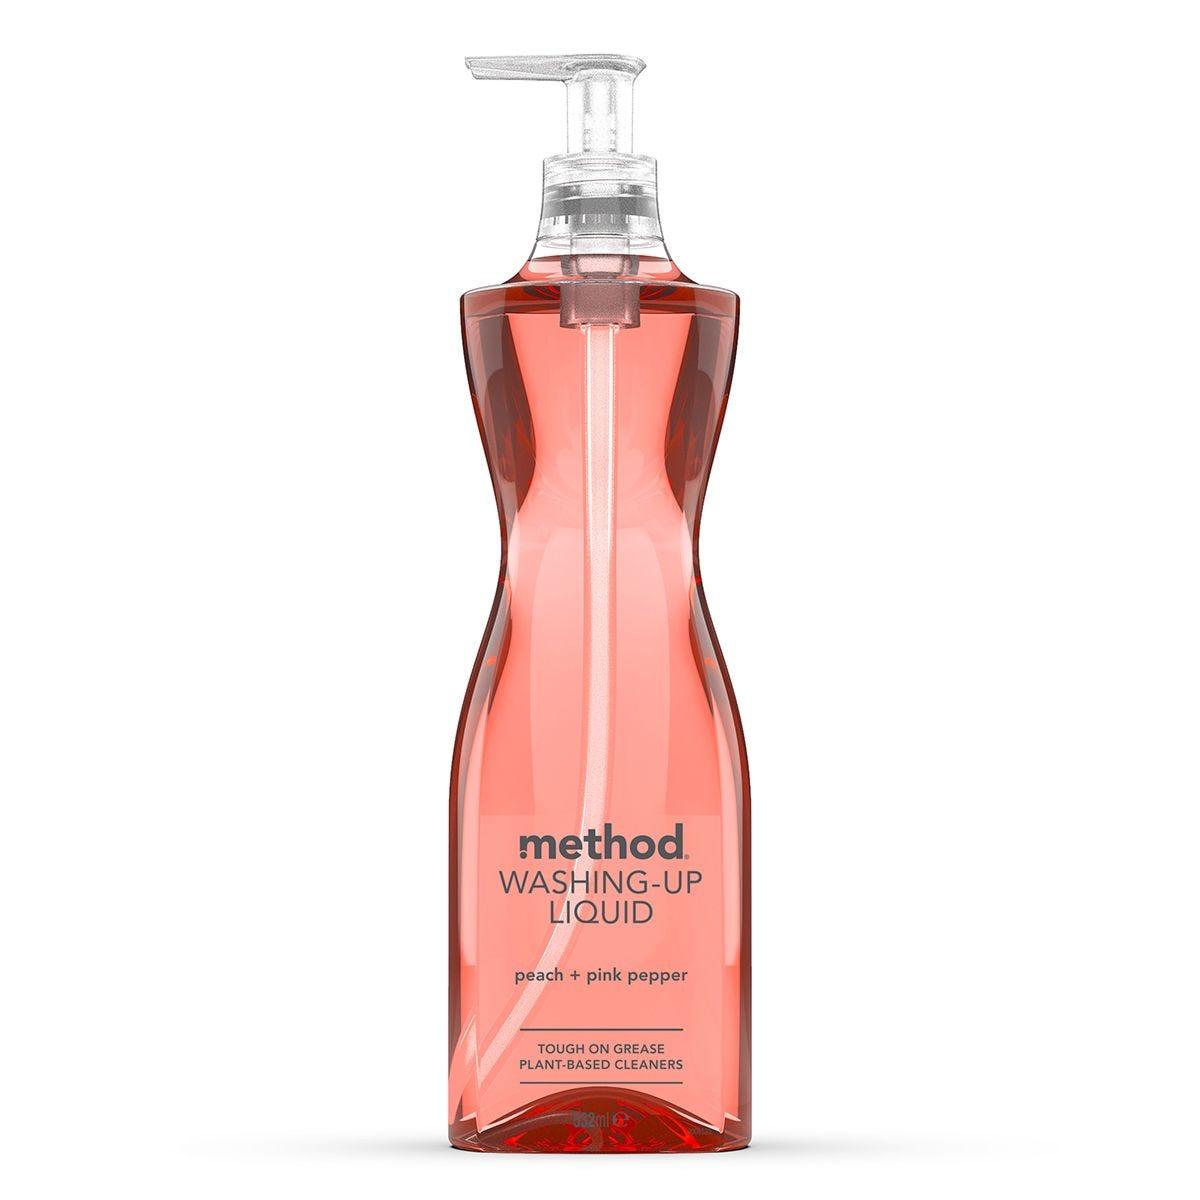 Method Washing Up Liquid - Peach & Peppercorn